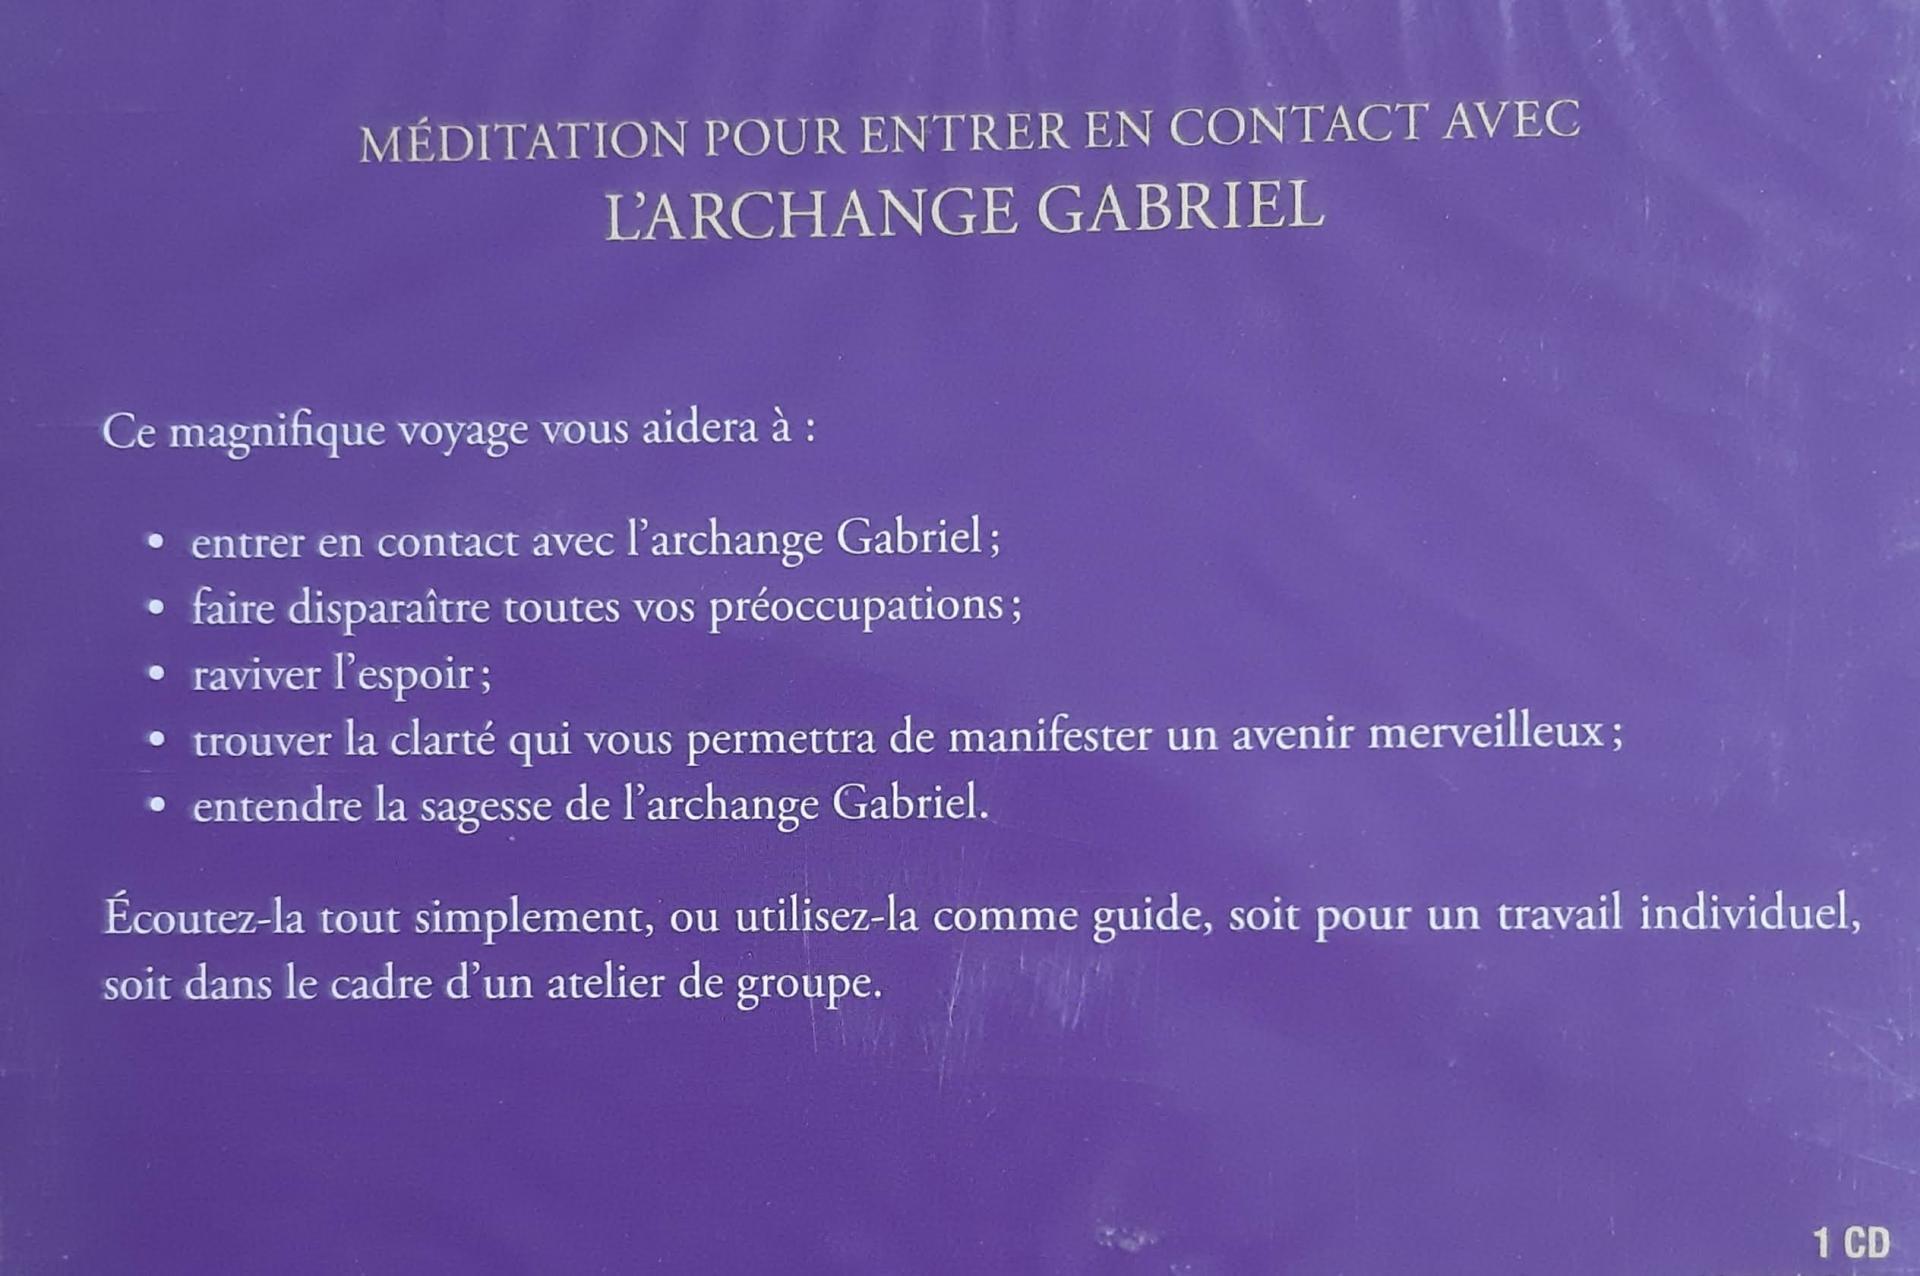 MEDITATION DE L'ARCHANGE GABRIEL DE DIANA COOPER